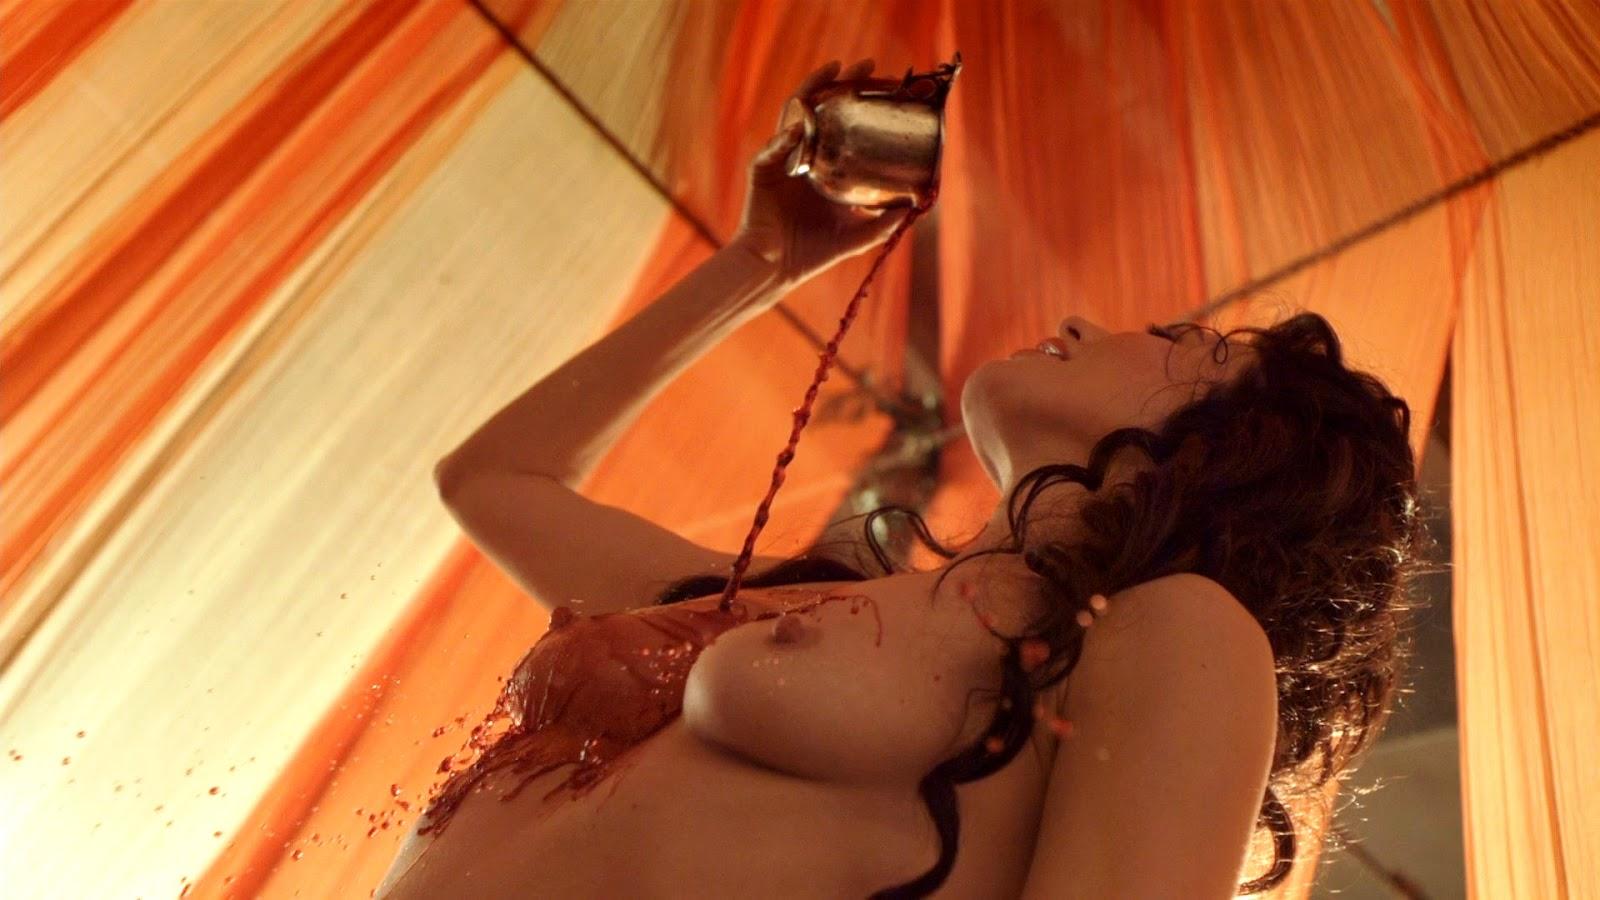 Indian hot sexy nude 3d photos free  nude scene